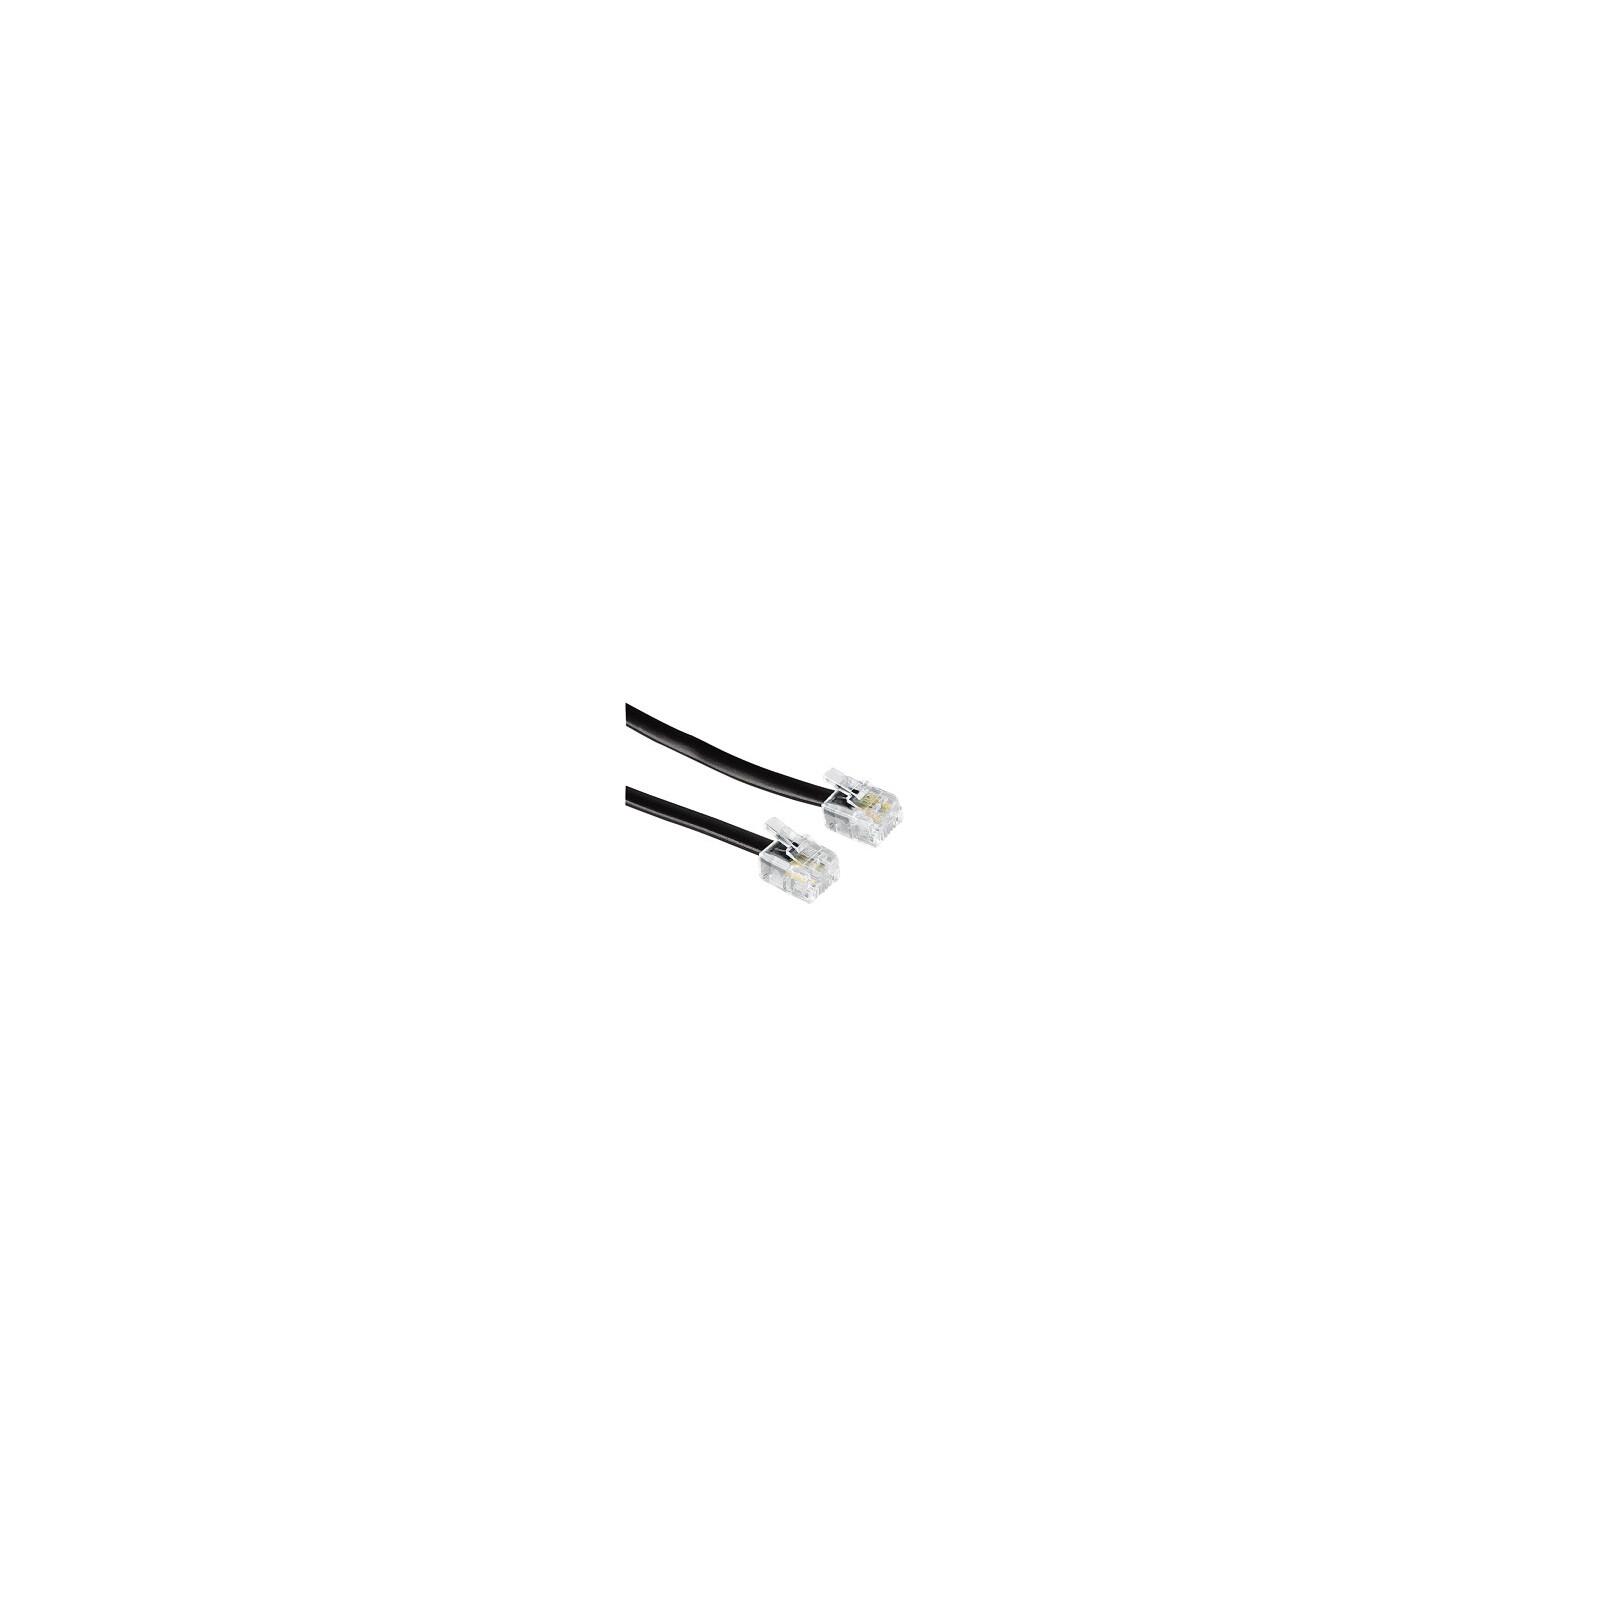 Hama 44930 Modularkabel, Stecker 6p4c - Stecker 6p4c, 6 m, S